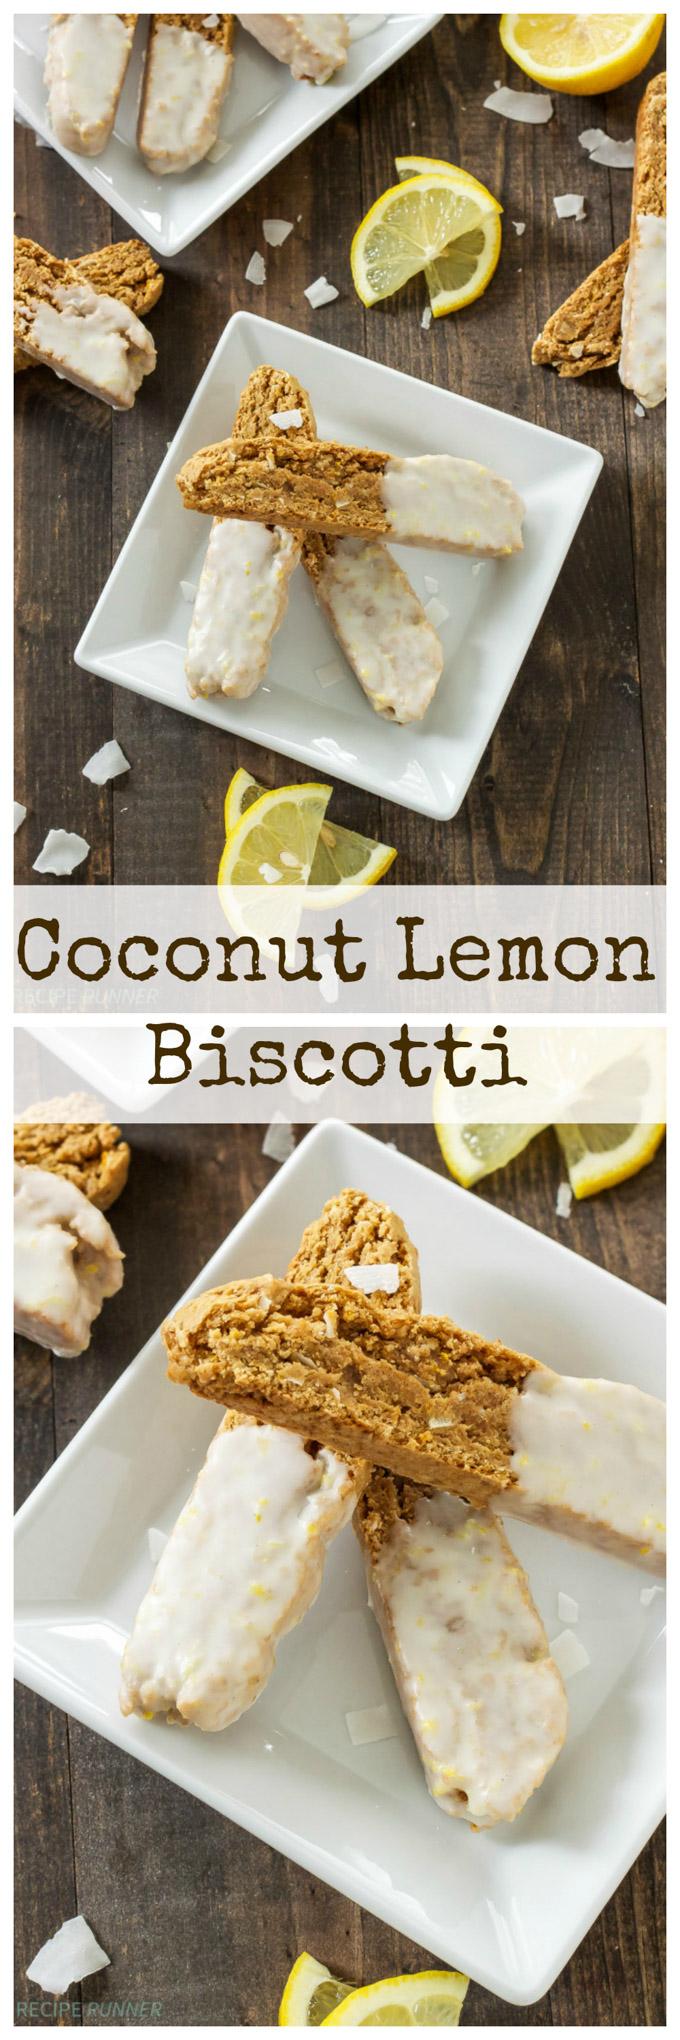 Coconut Lemon Biscotti | Crunchy biscotti full of coconut and lemon flavors!